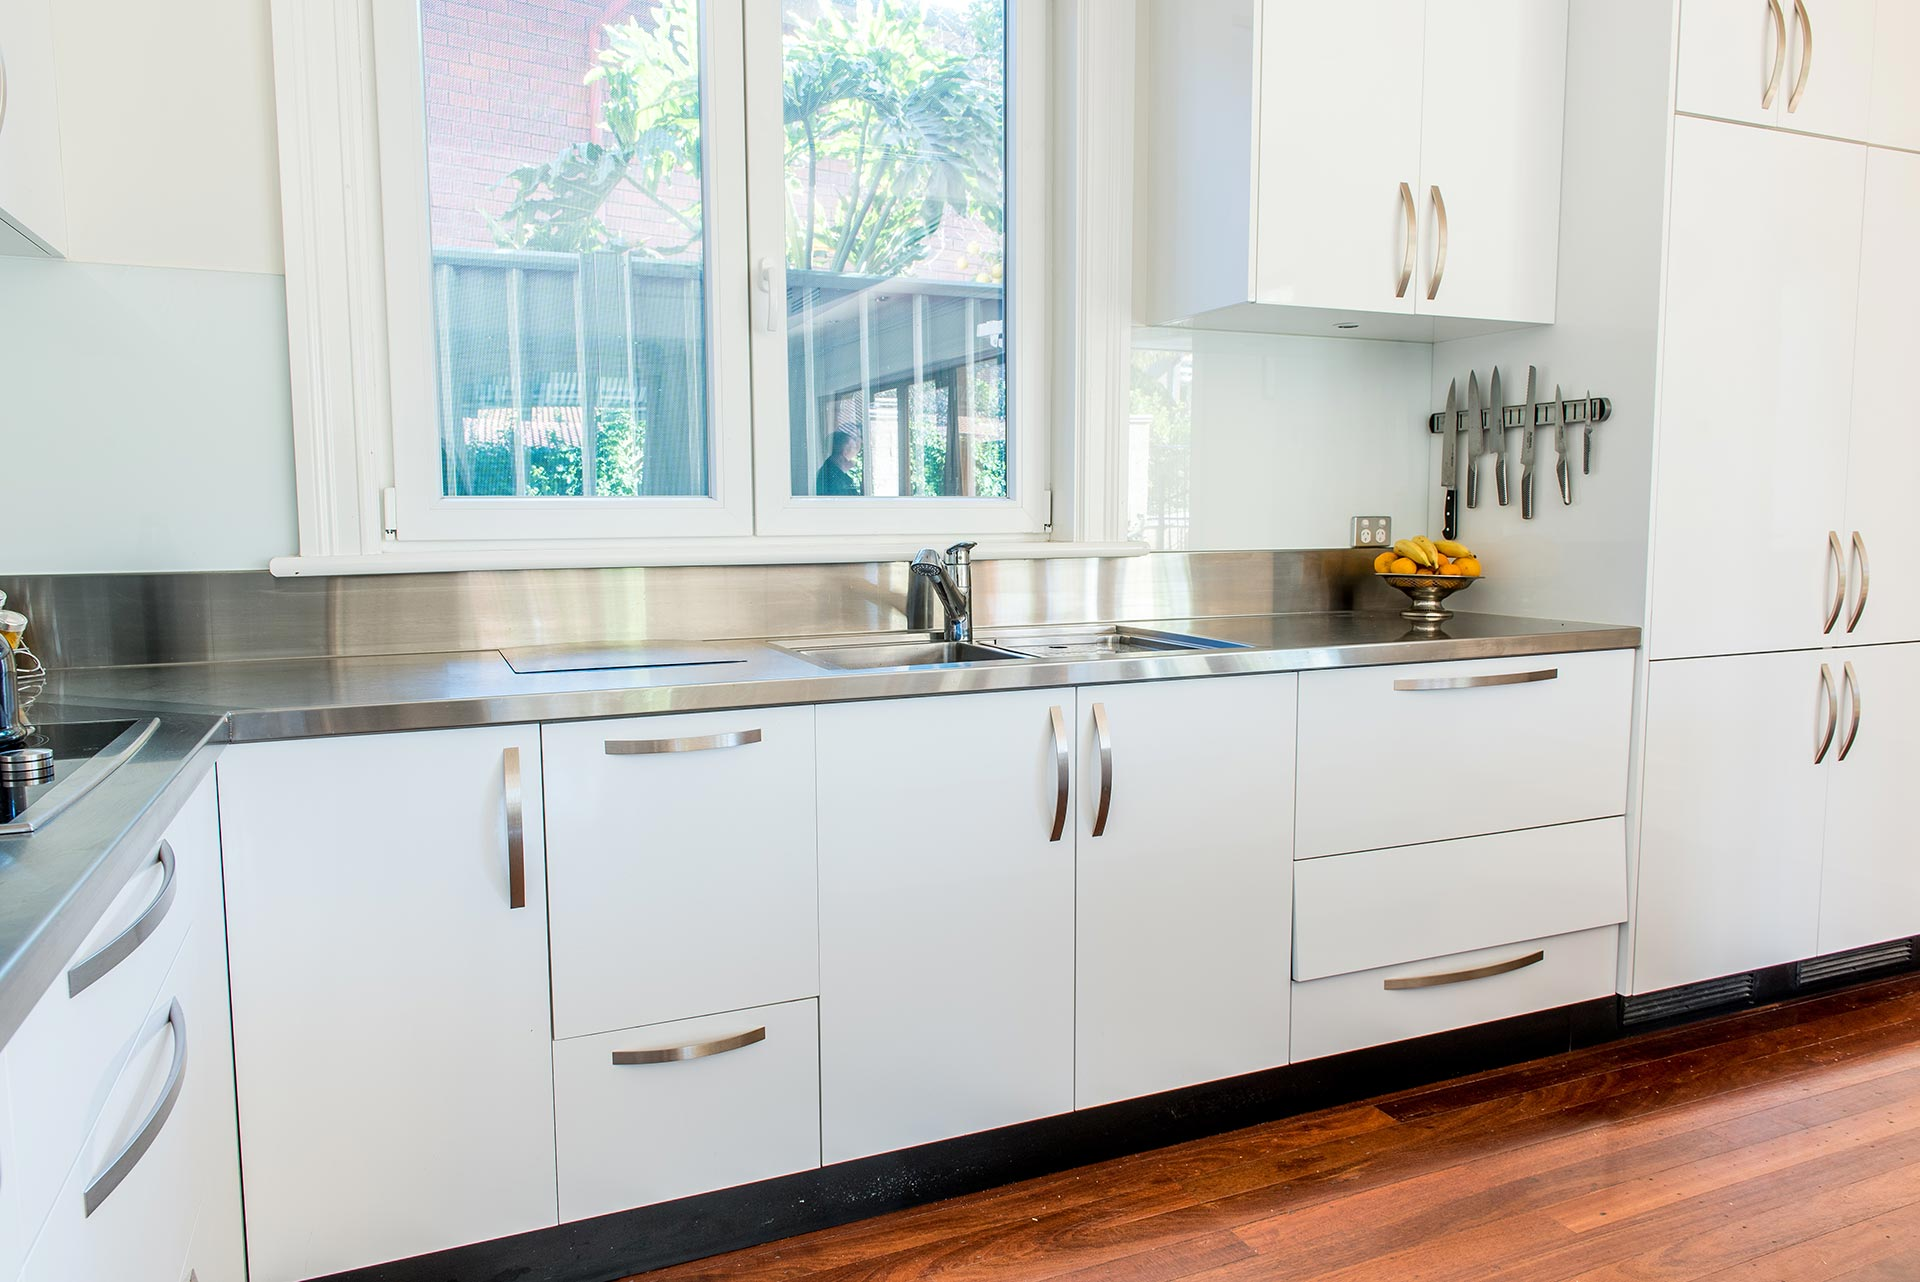 kitchen renovations perth | luxury kitchen perth - alltech cabinets